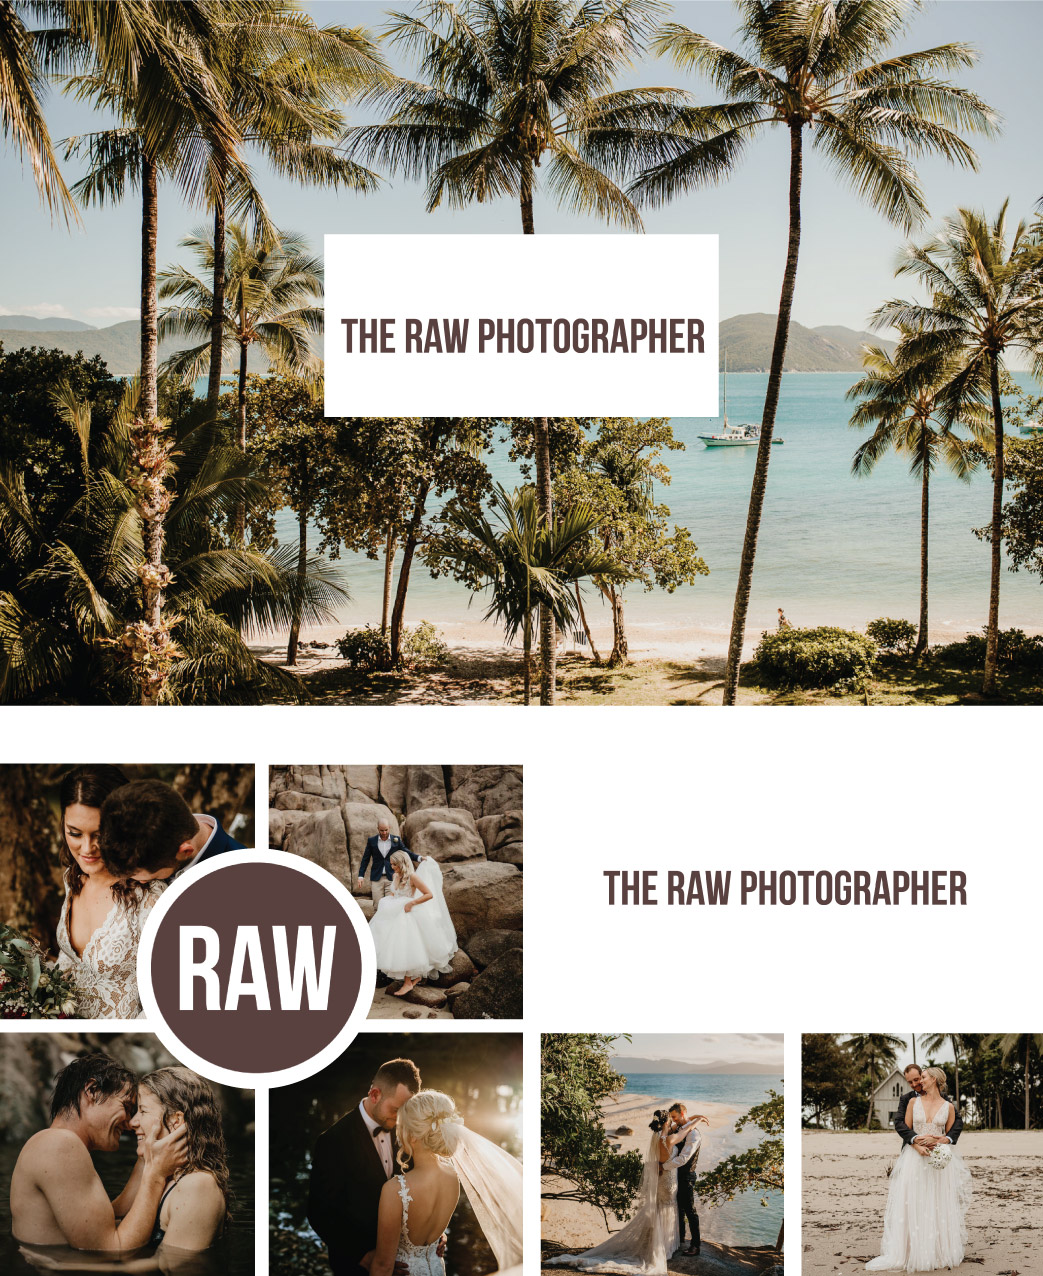 Imo-Creative---Branding-and-Website-Design---The-Raw-Photographer---Wedding-Cairns.jpg